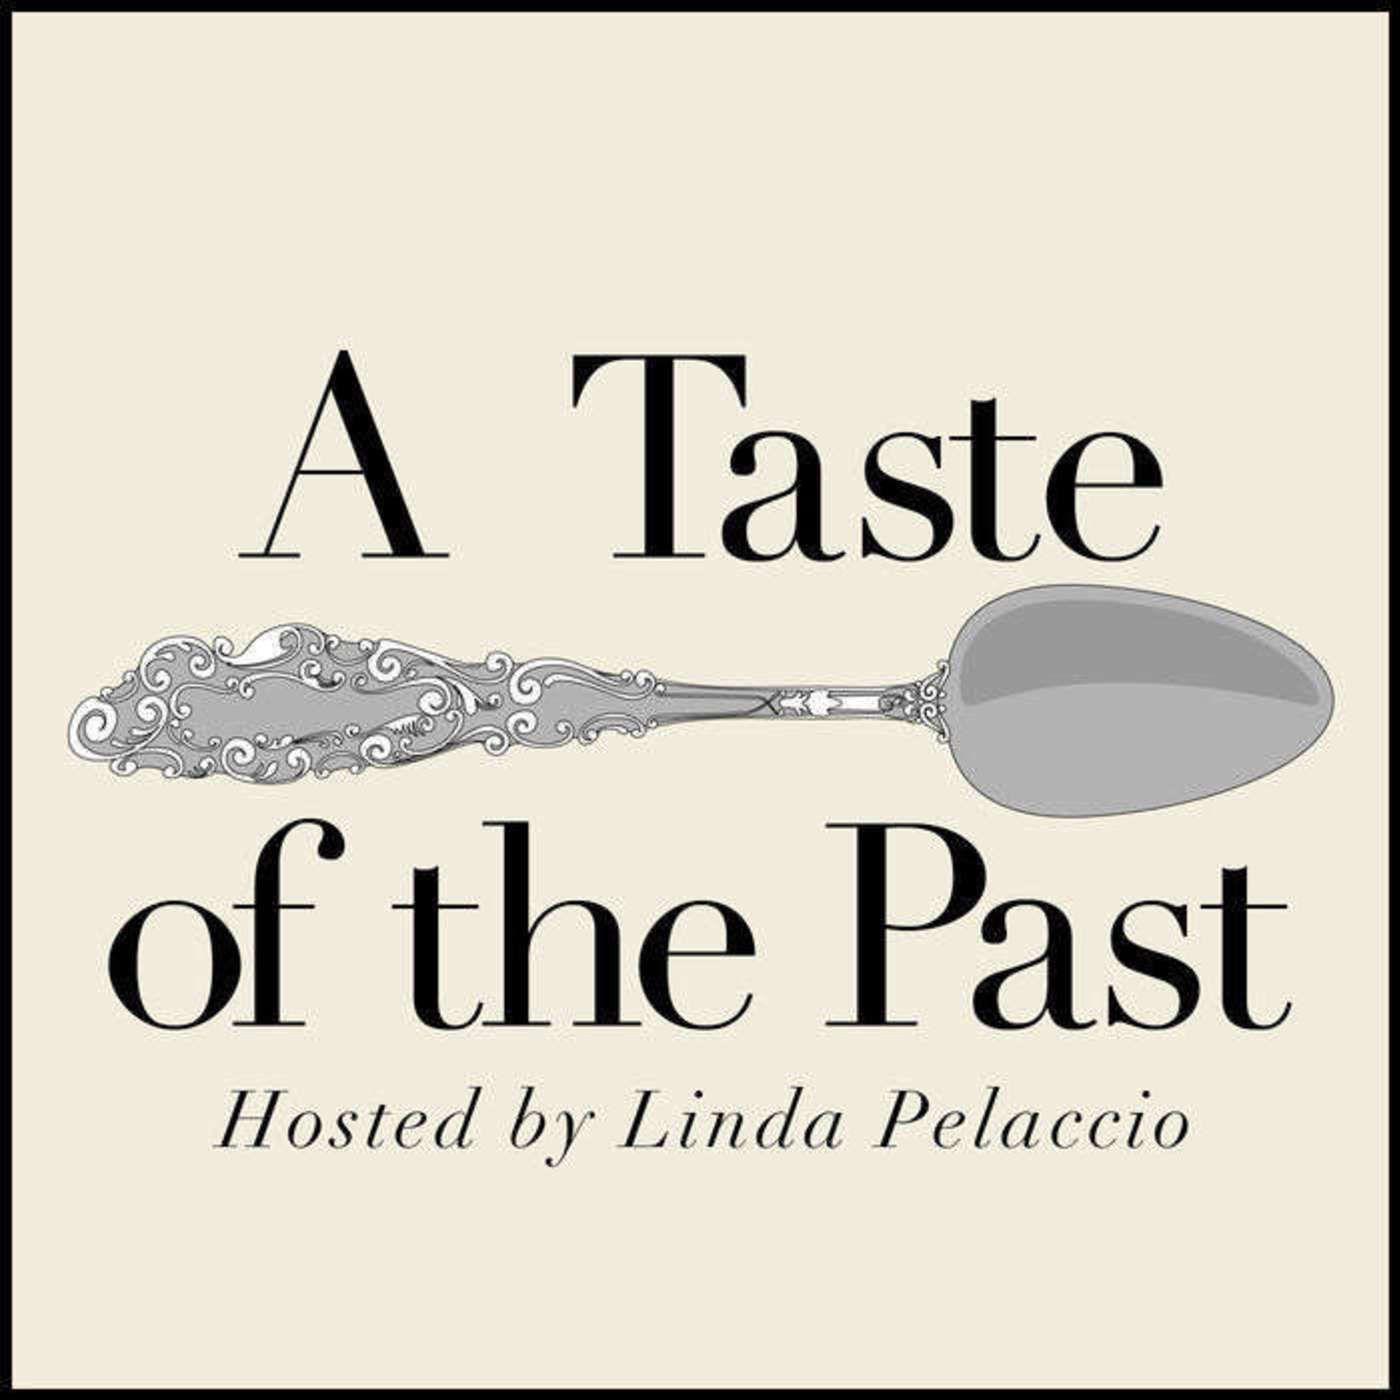 Episode 157: Alice Ross on the History of Christmas Dinner